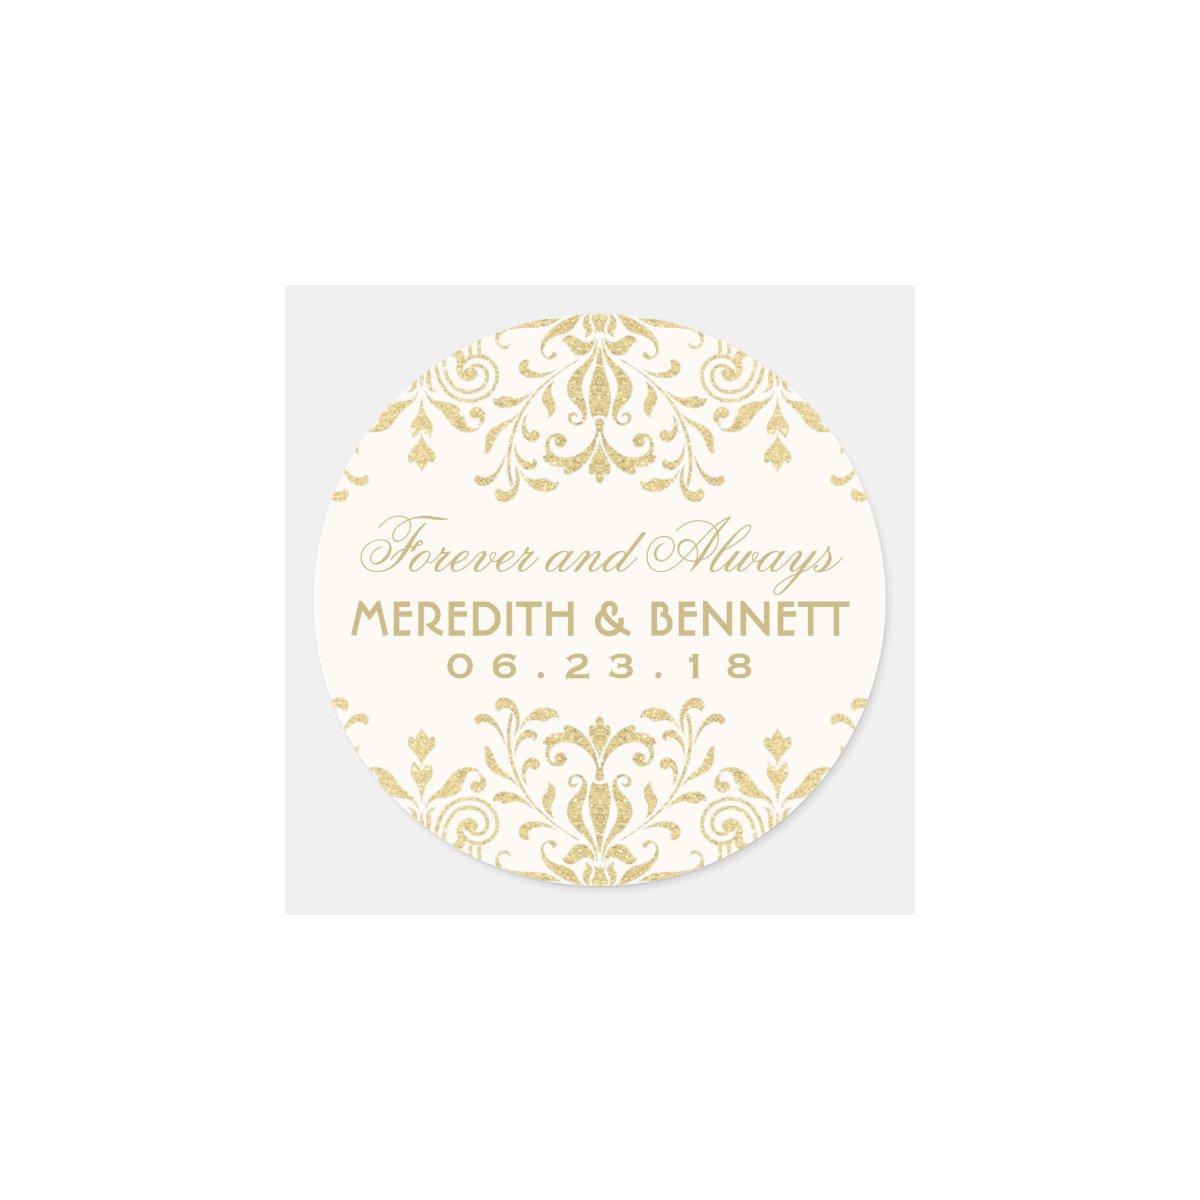 wedding favor labels - Wedding Decor Ideas